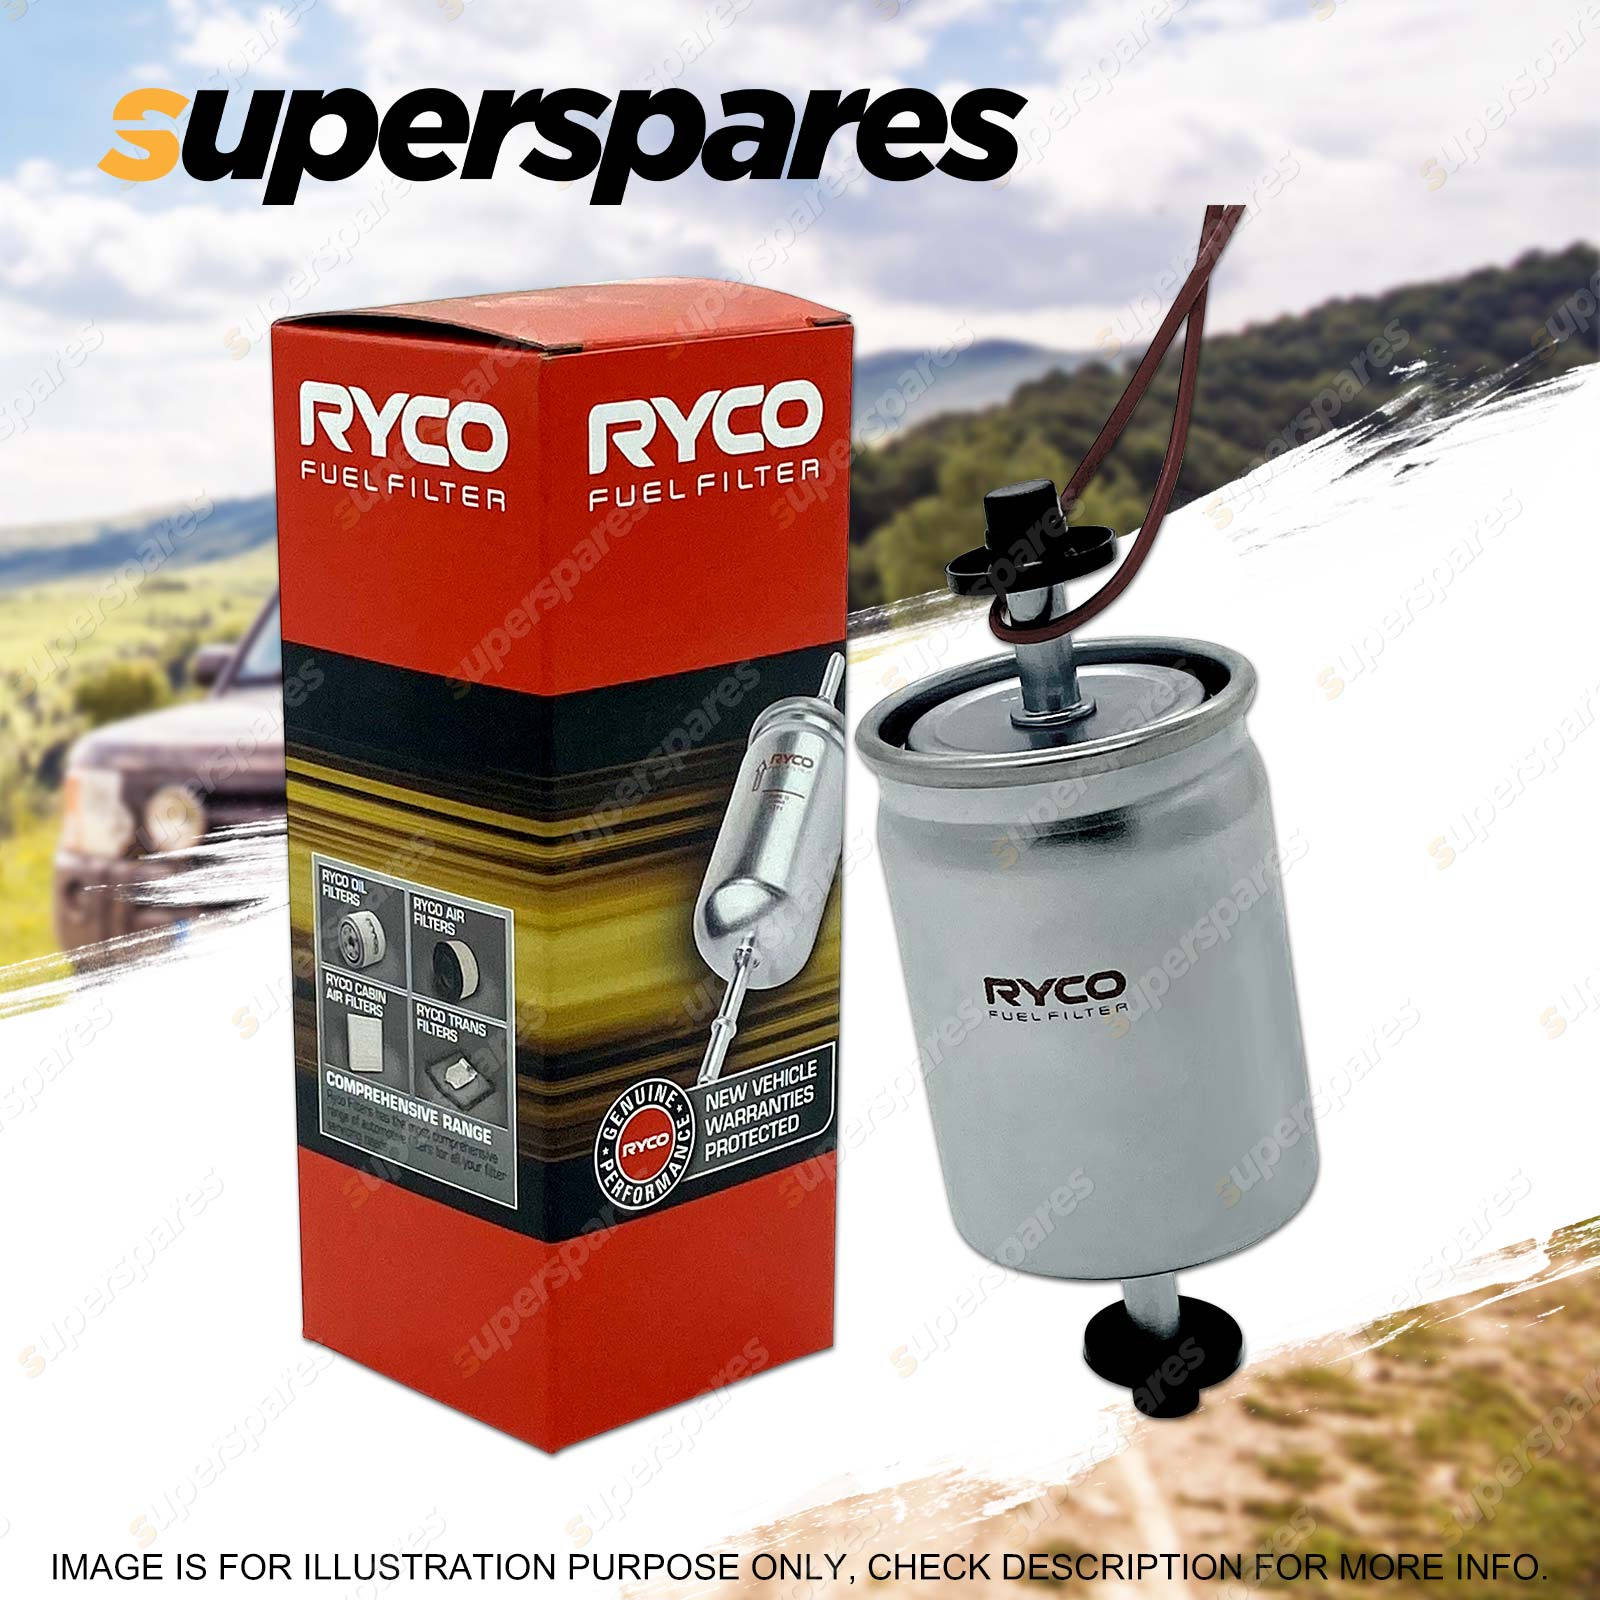 hight resolution of ryco fuel filter for dodge nitro jeep wrangler jk cherokee kk turboryco fuel filter for dodge